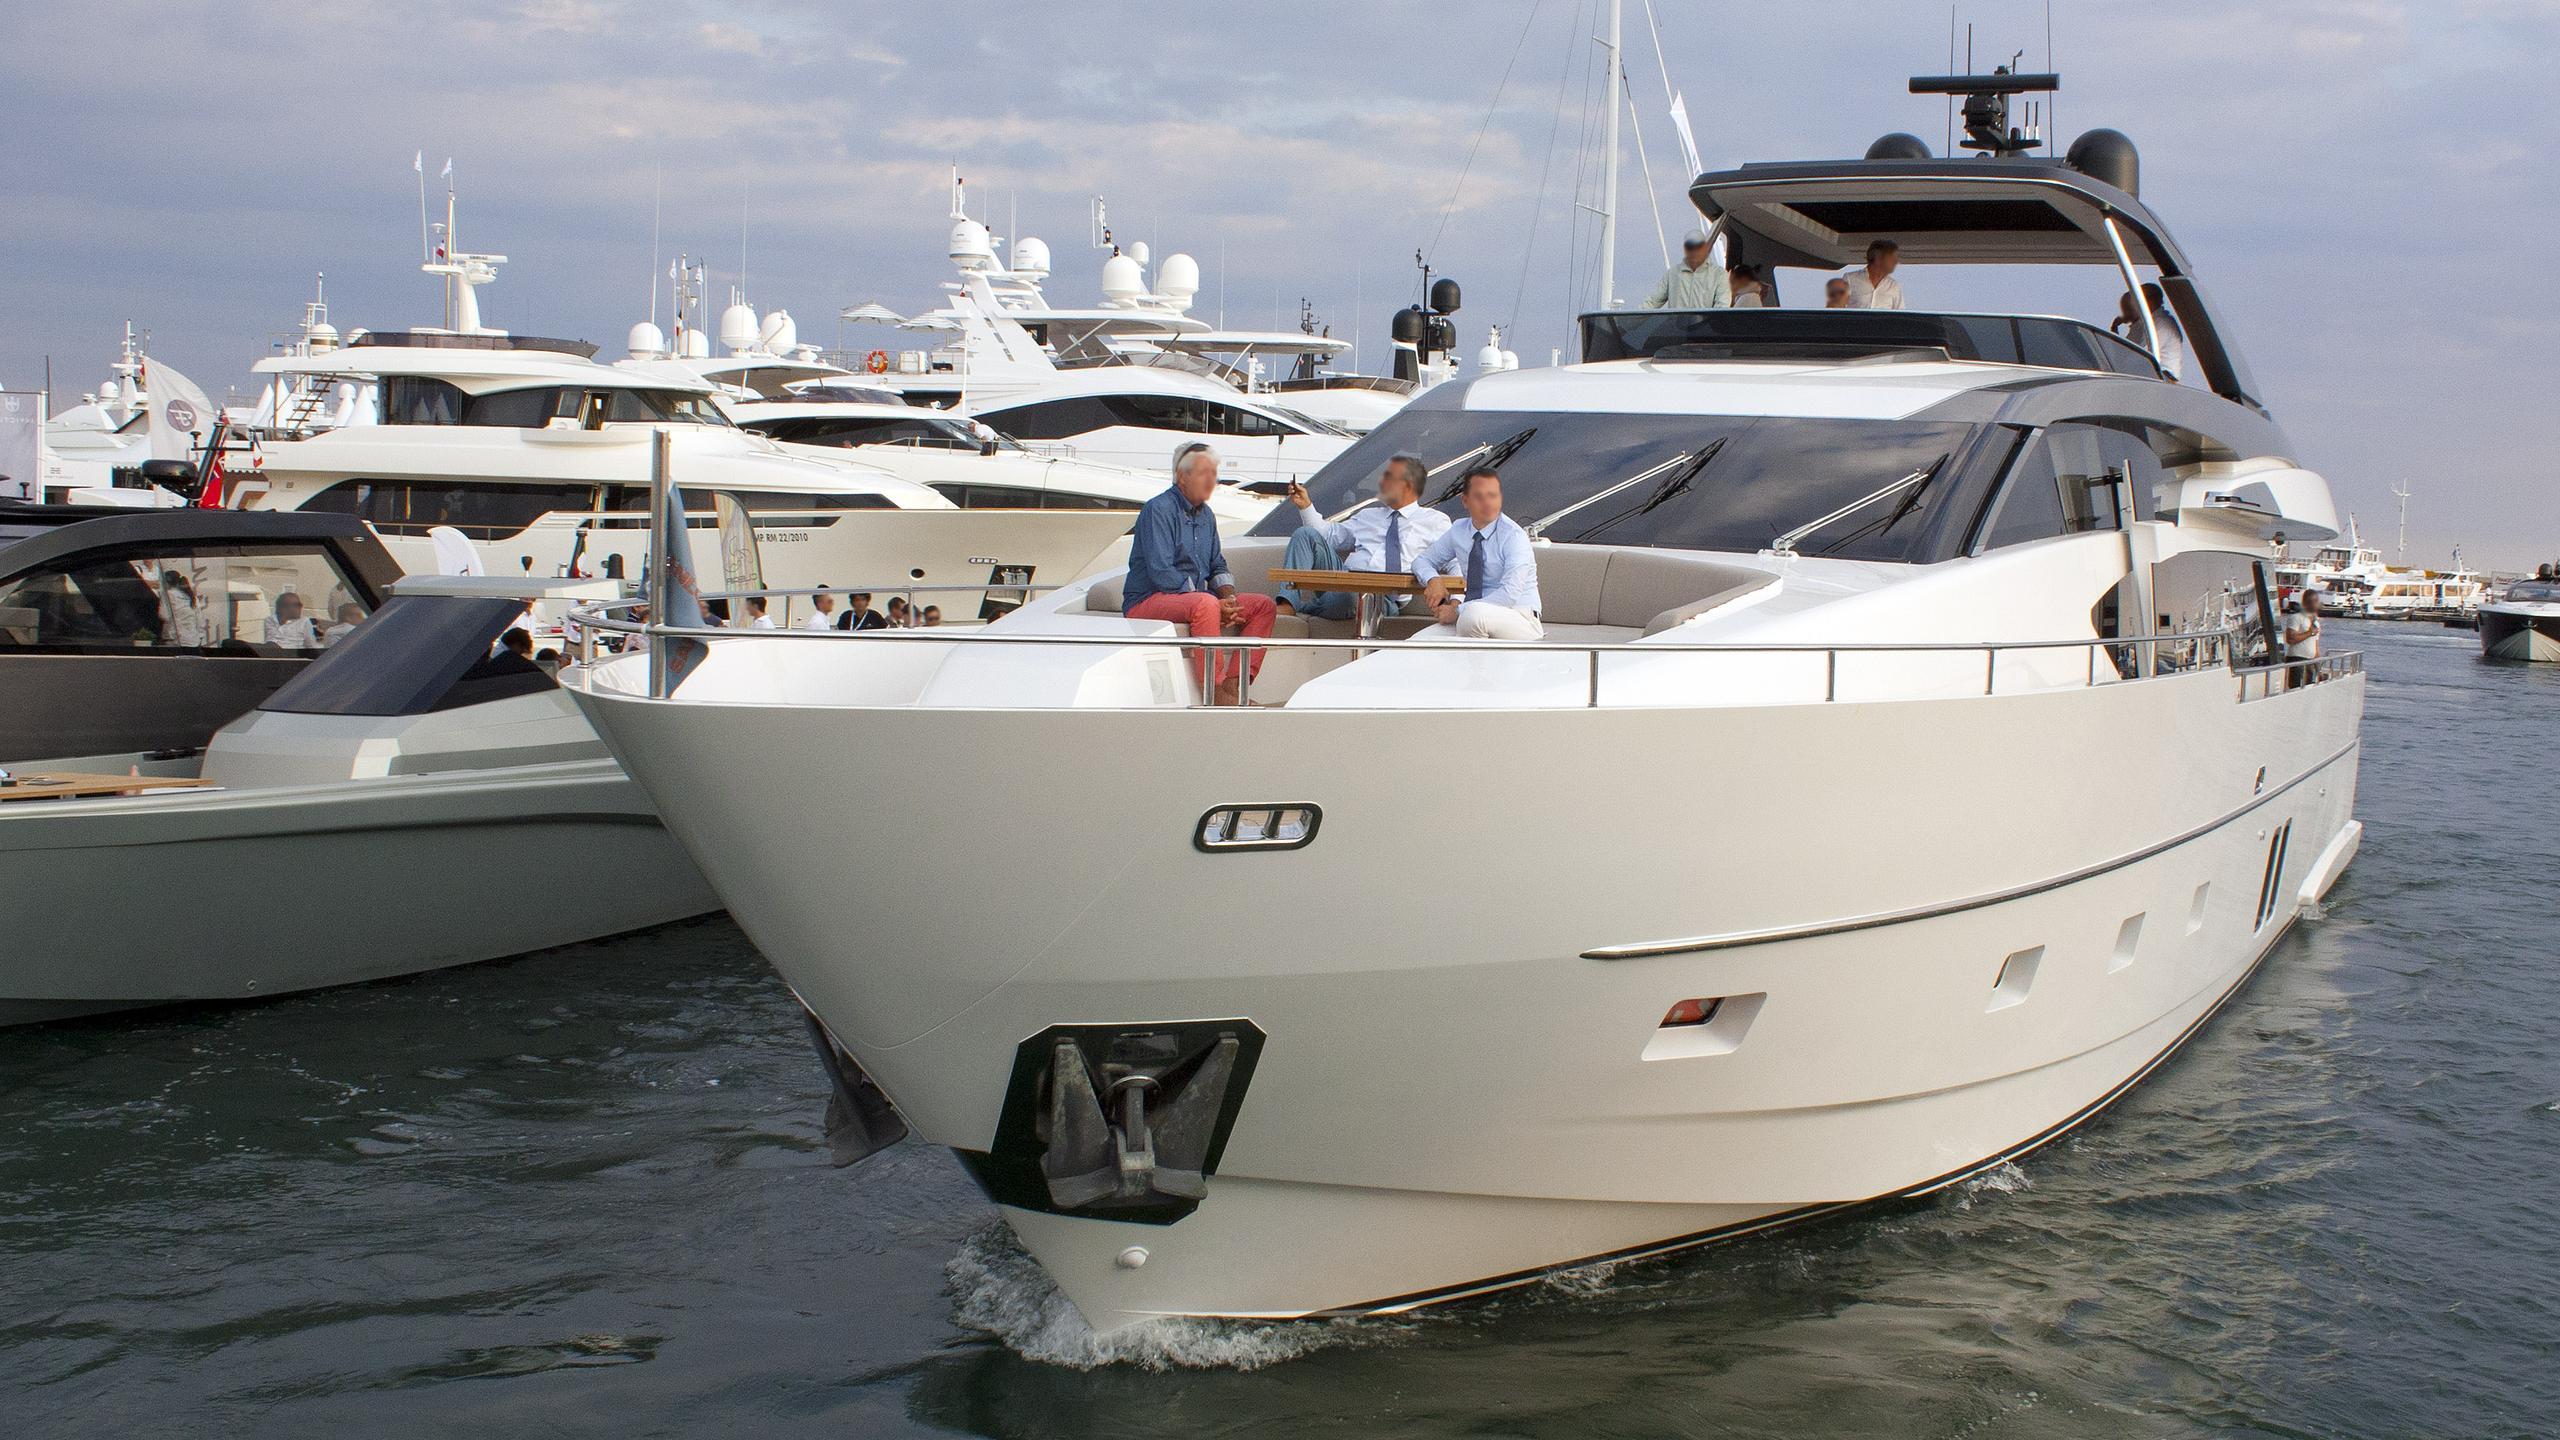 adriatic motor yacht sanlorenzo sl 86 2015 27m half profile